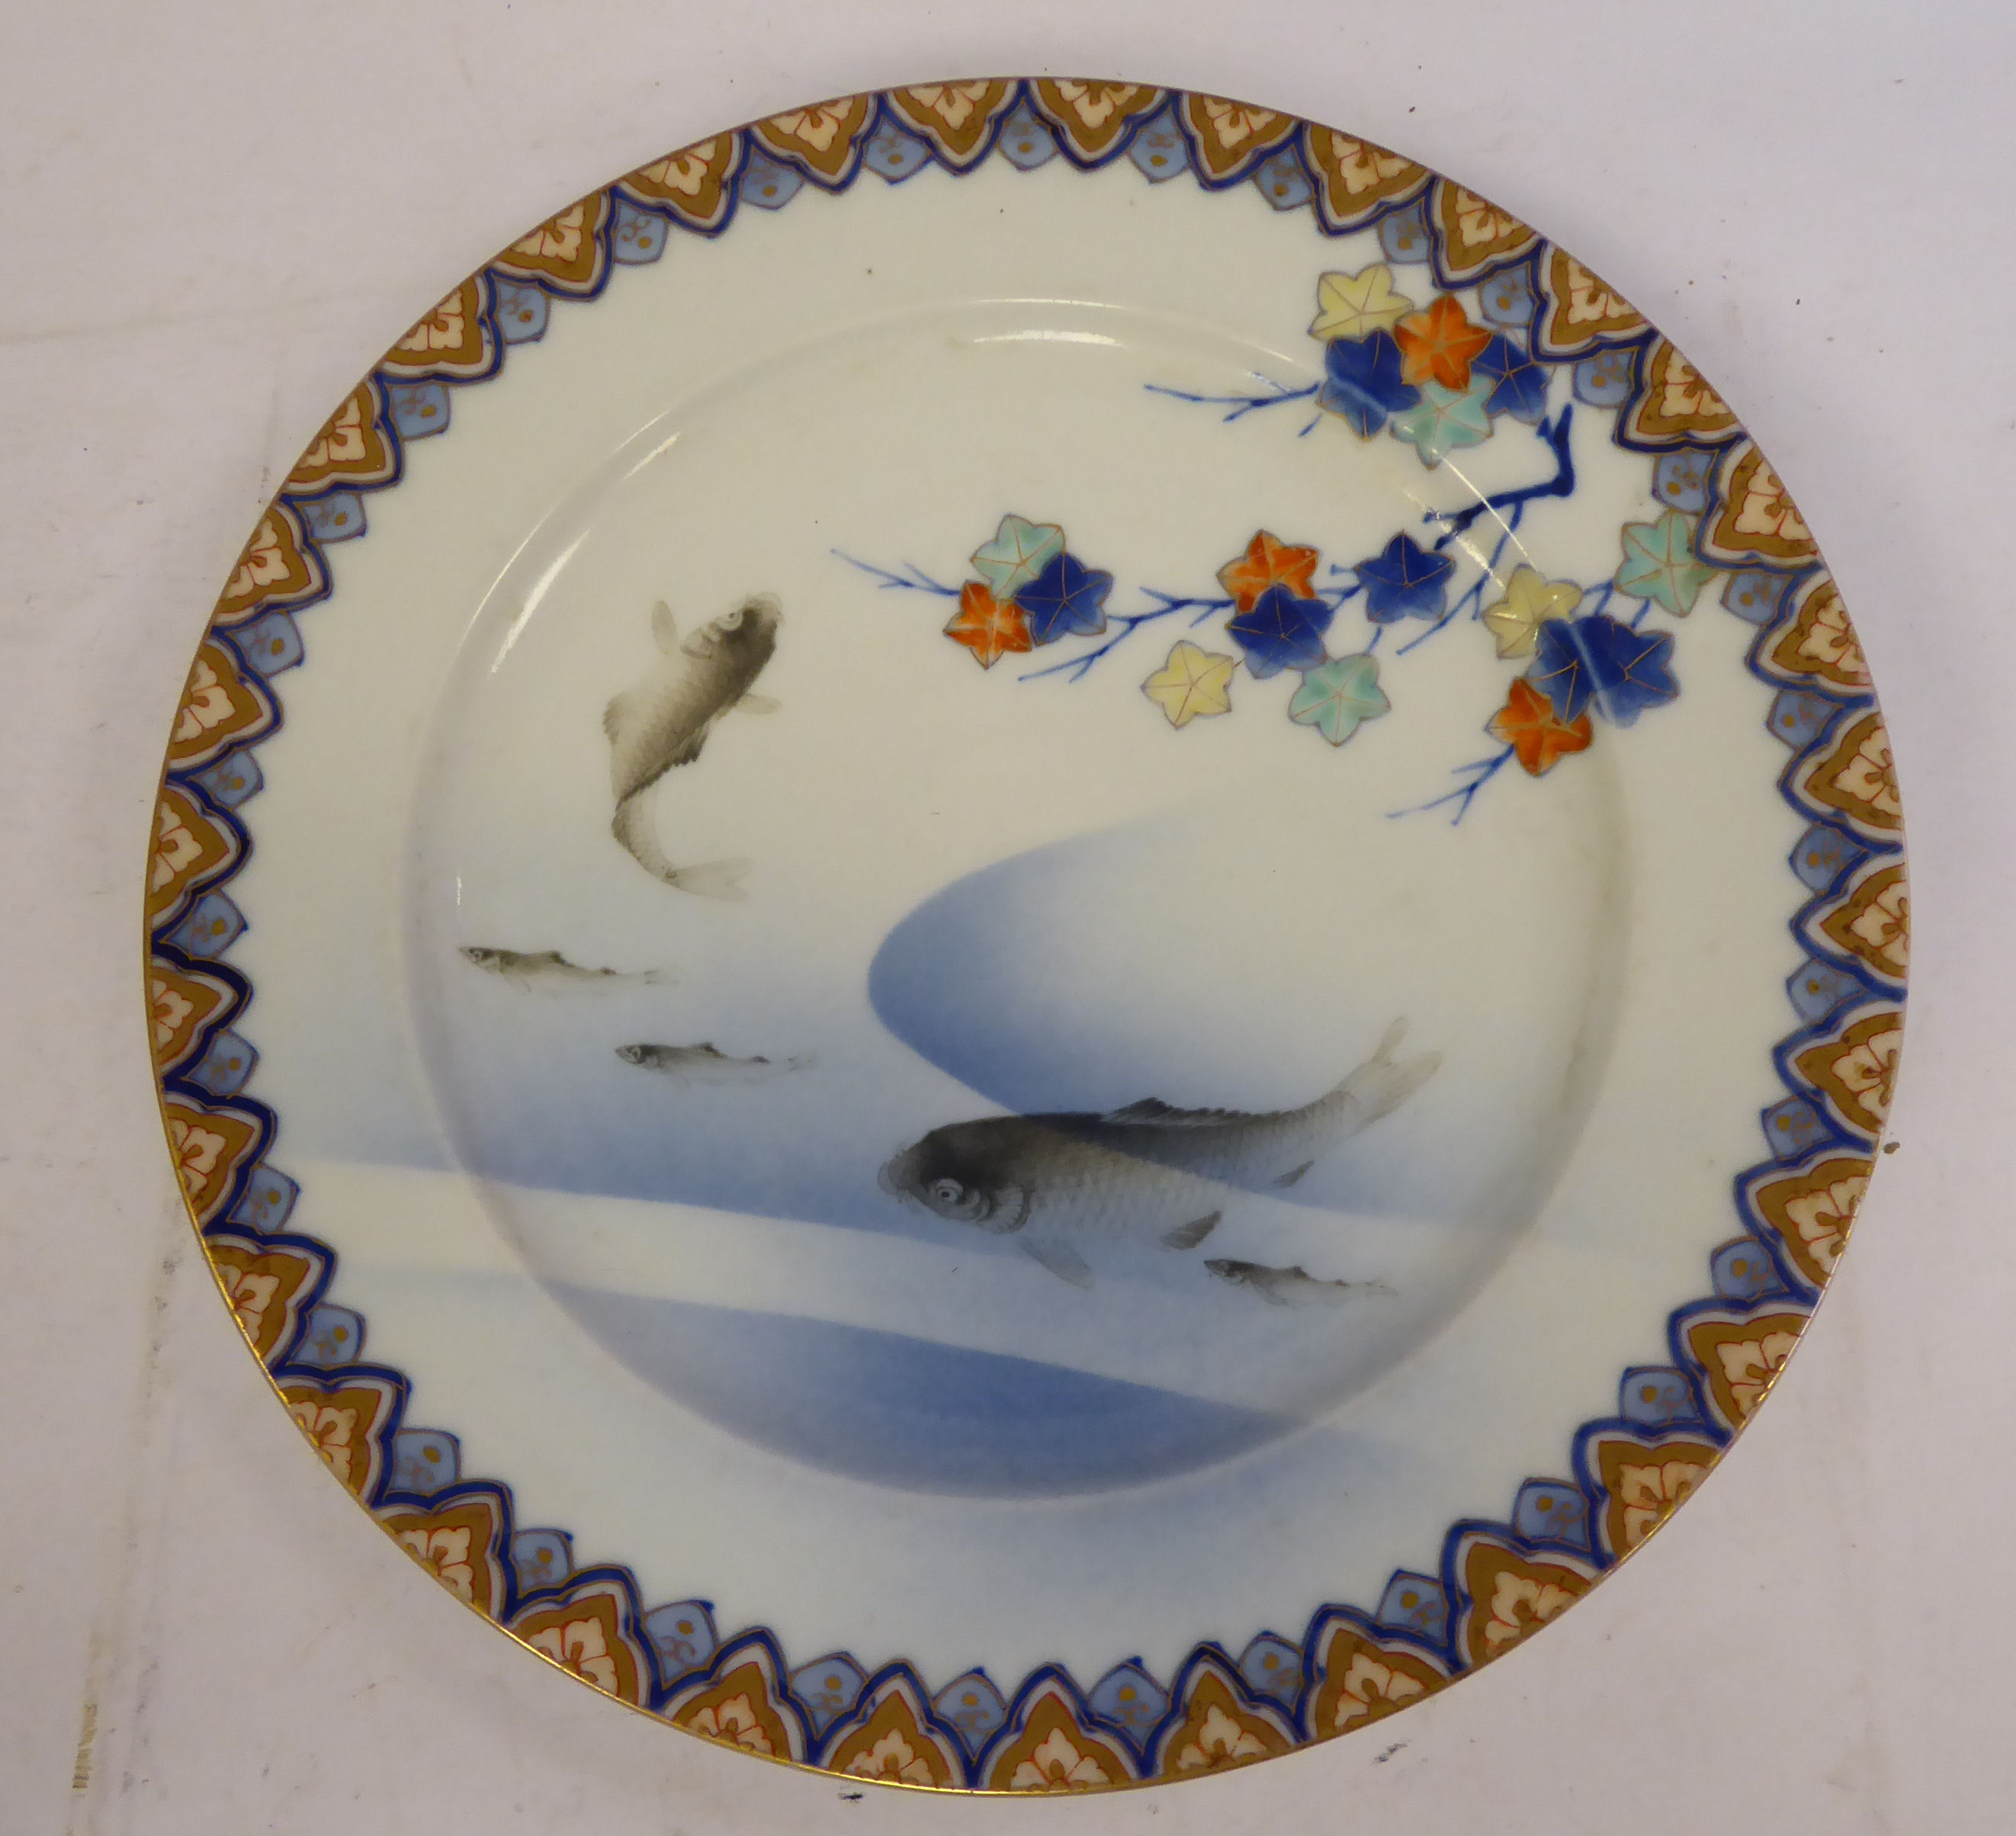 Lot 15 - An early 20thC Japanese Fukugawa porcelain footed dish,